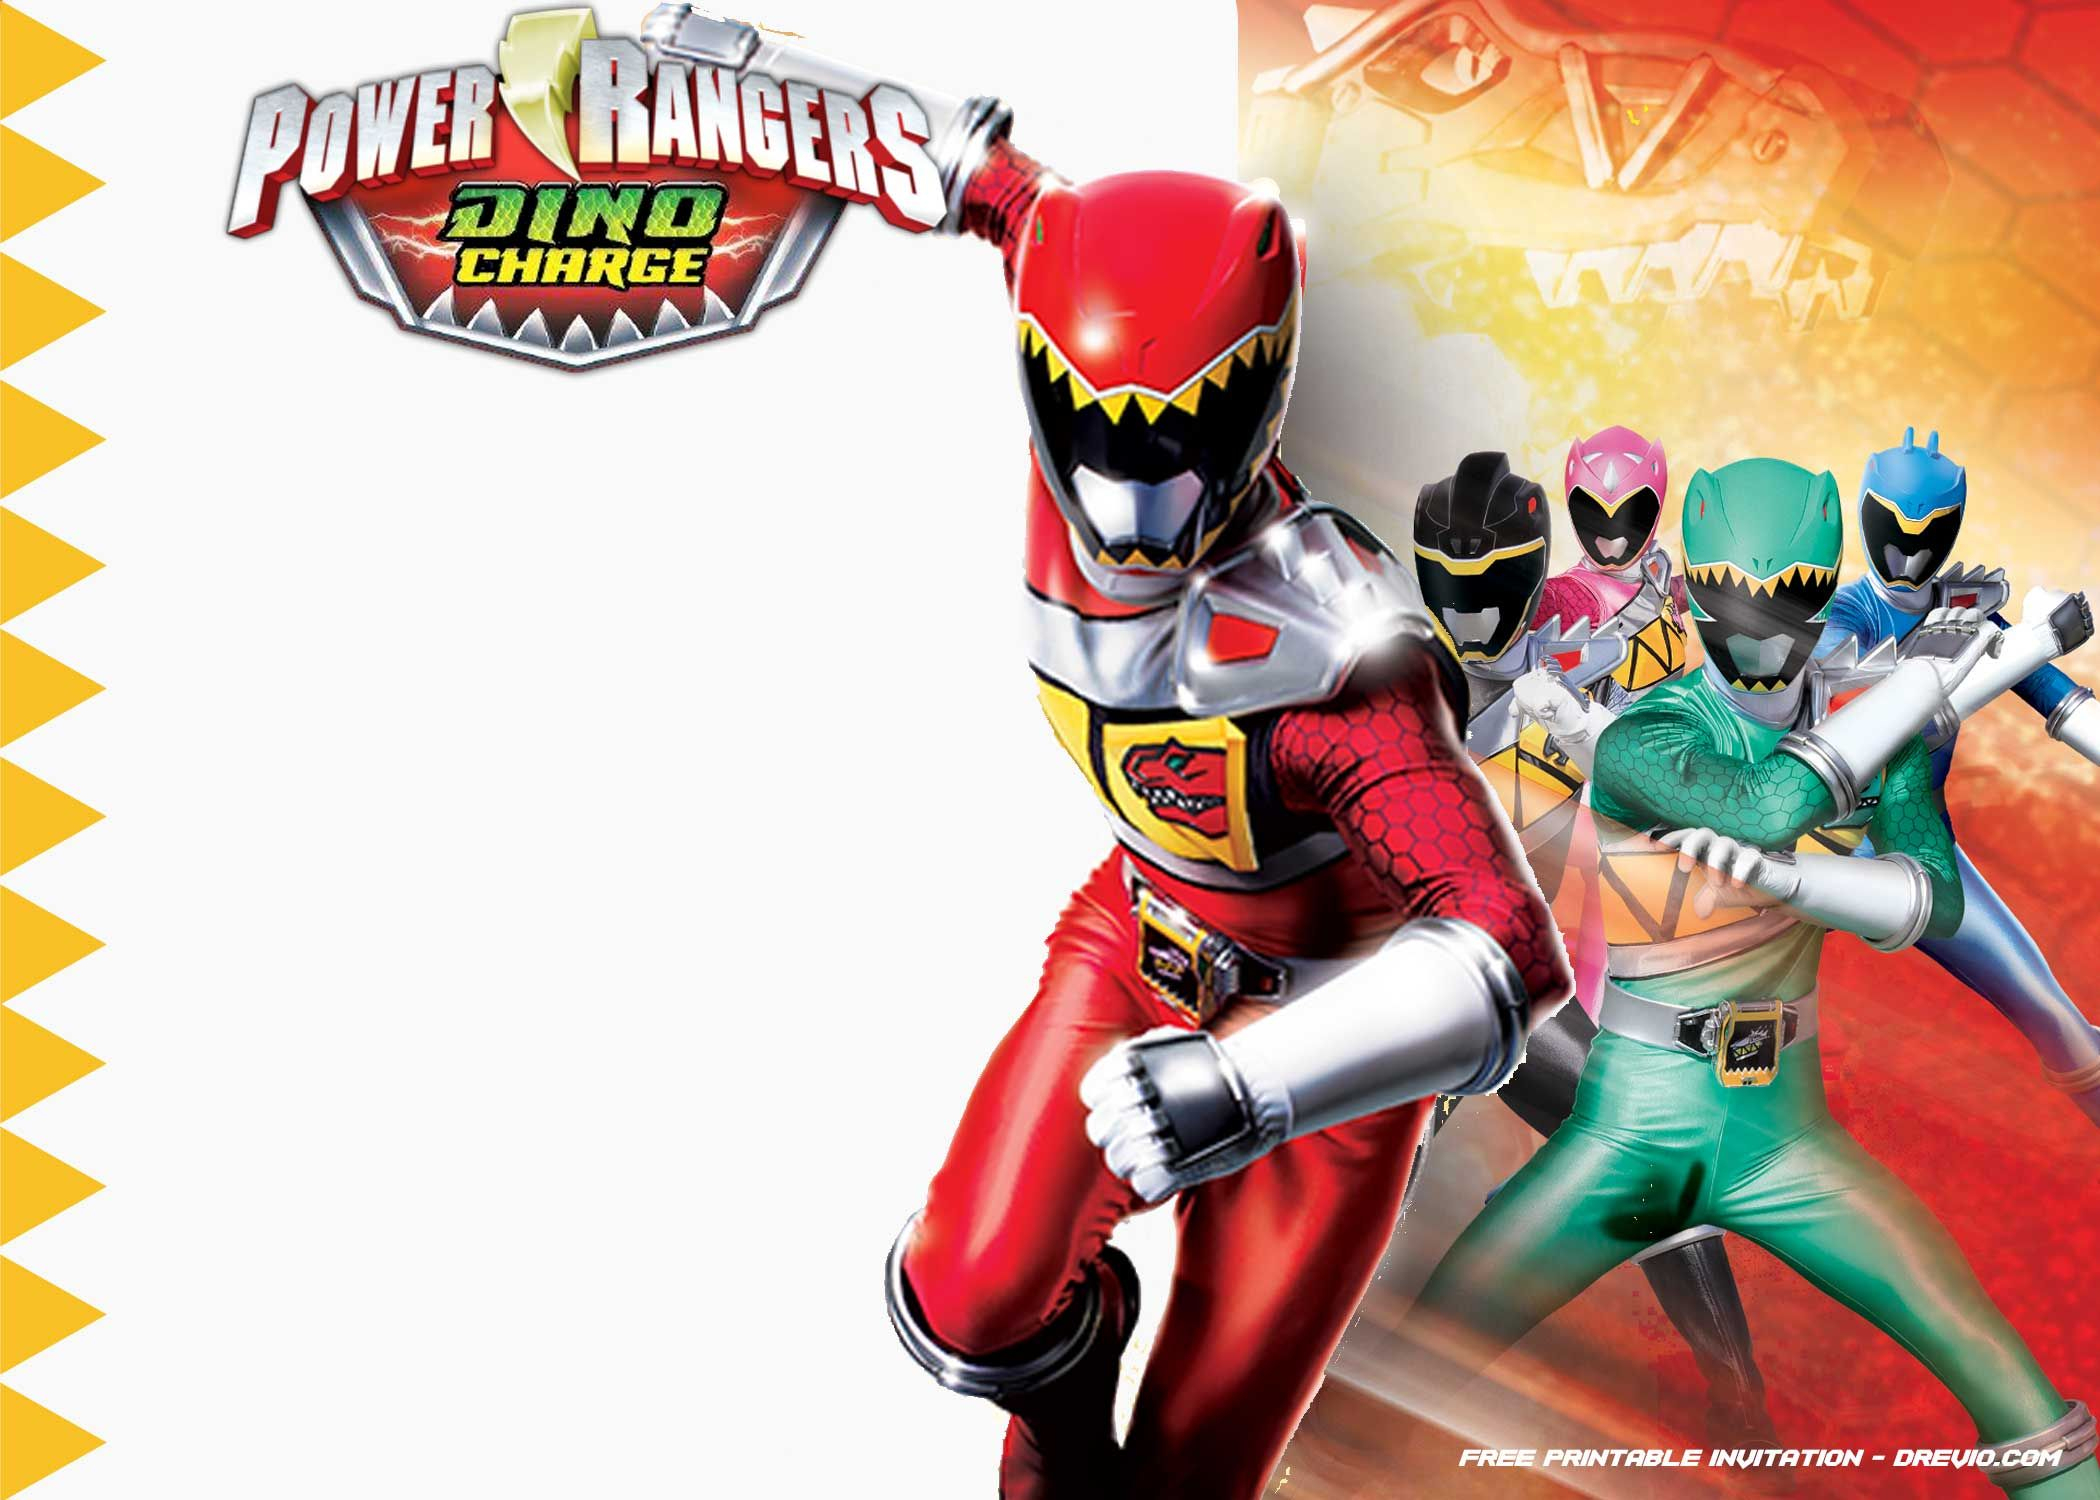 Free Printable Power Rangers Dino Charge Invitation | Desserts - Free Printable Power Ranger Birthday Invitations